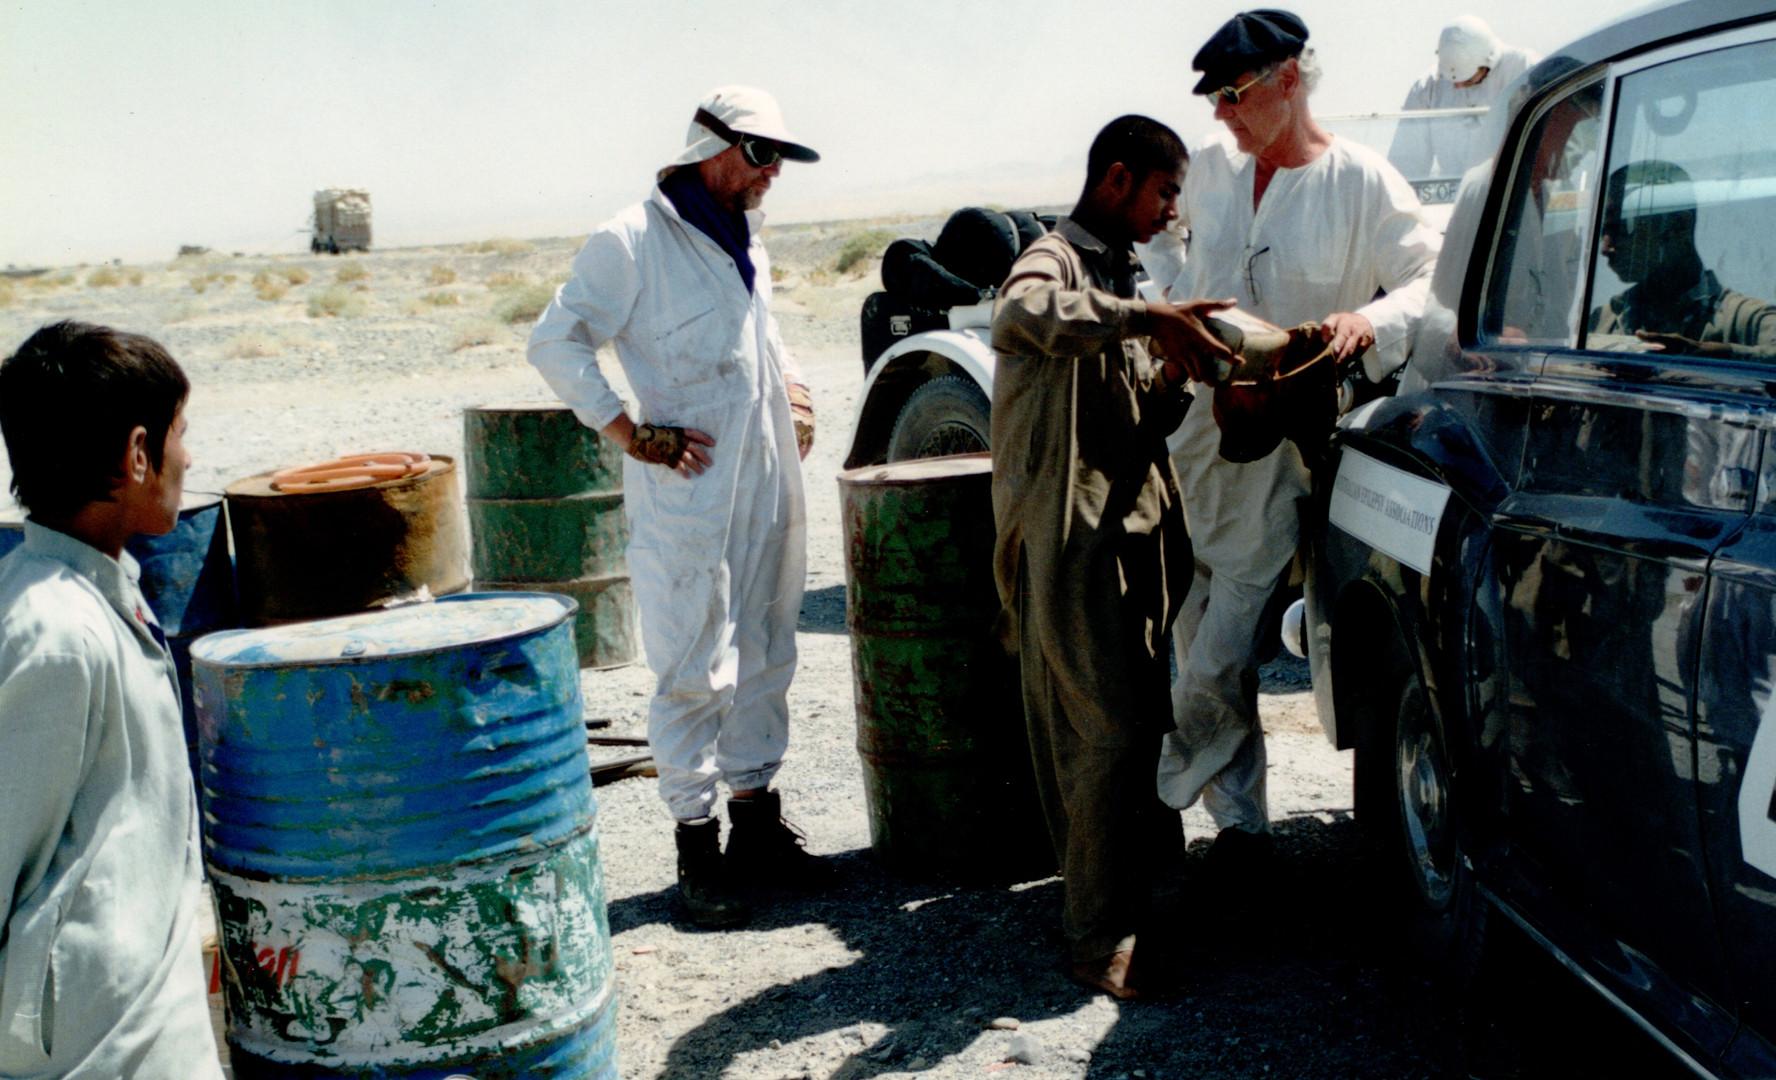 20 P2P loading petrol in Pakistan desert near Irani border.